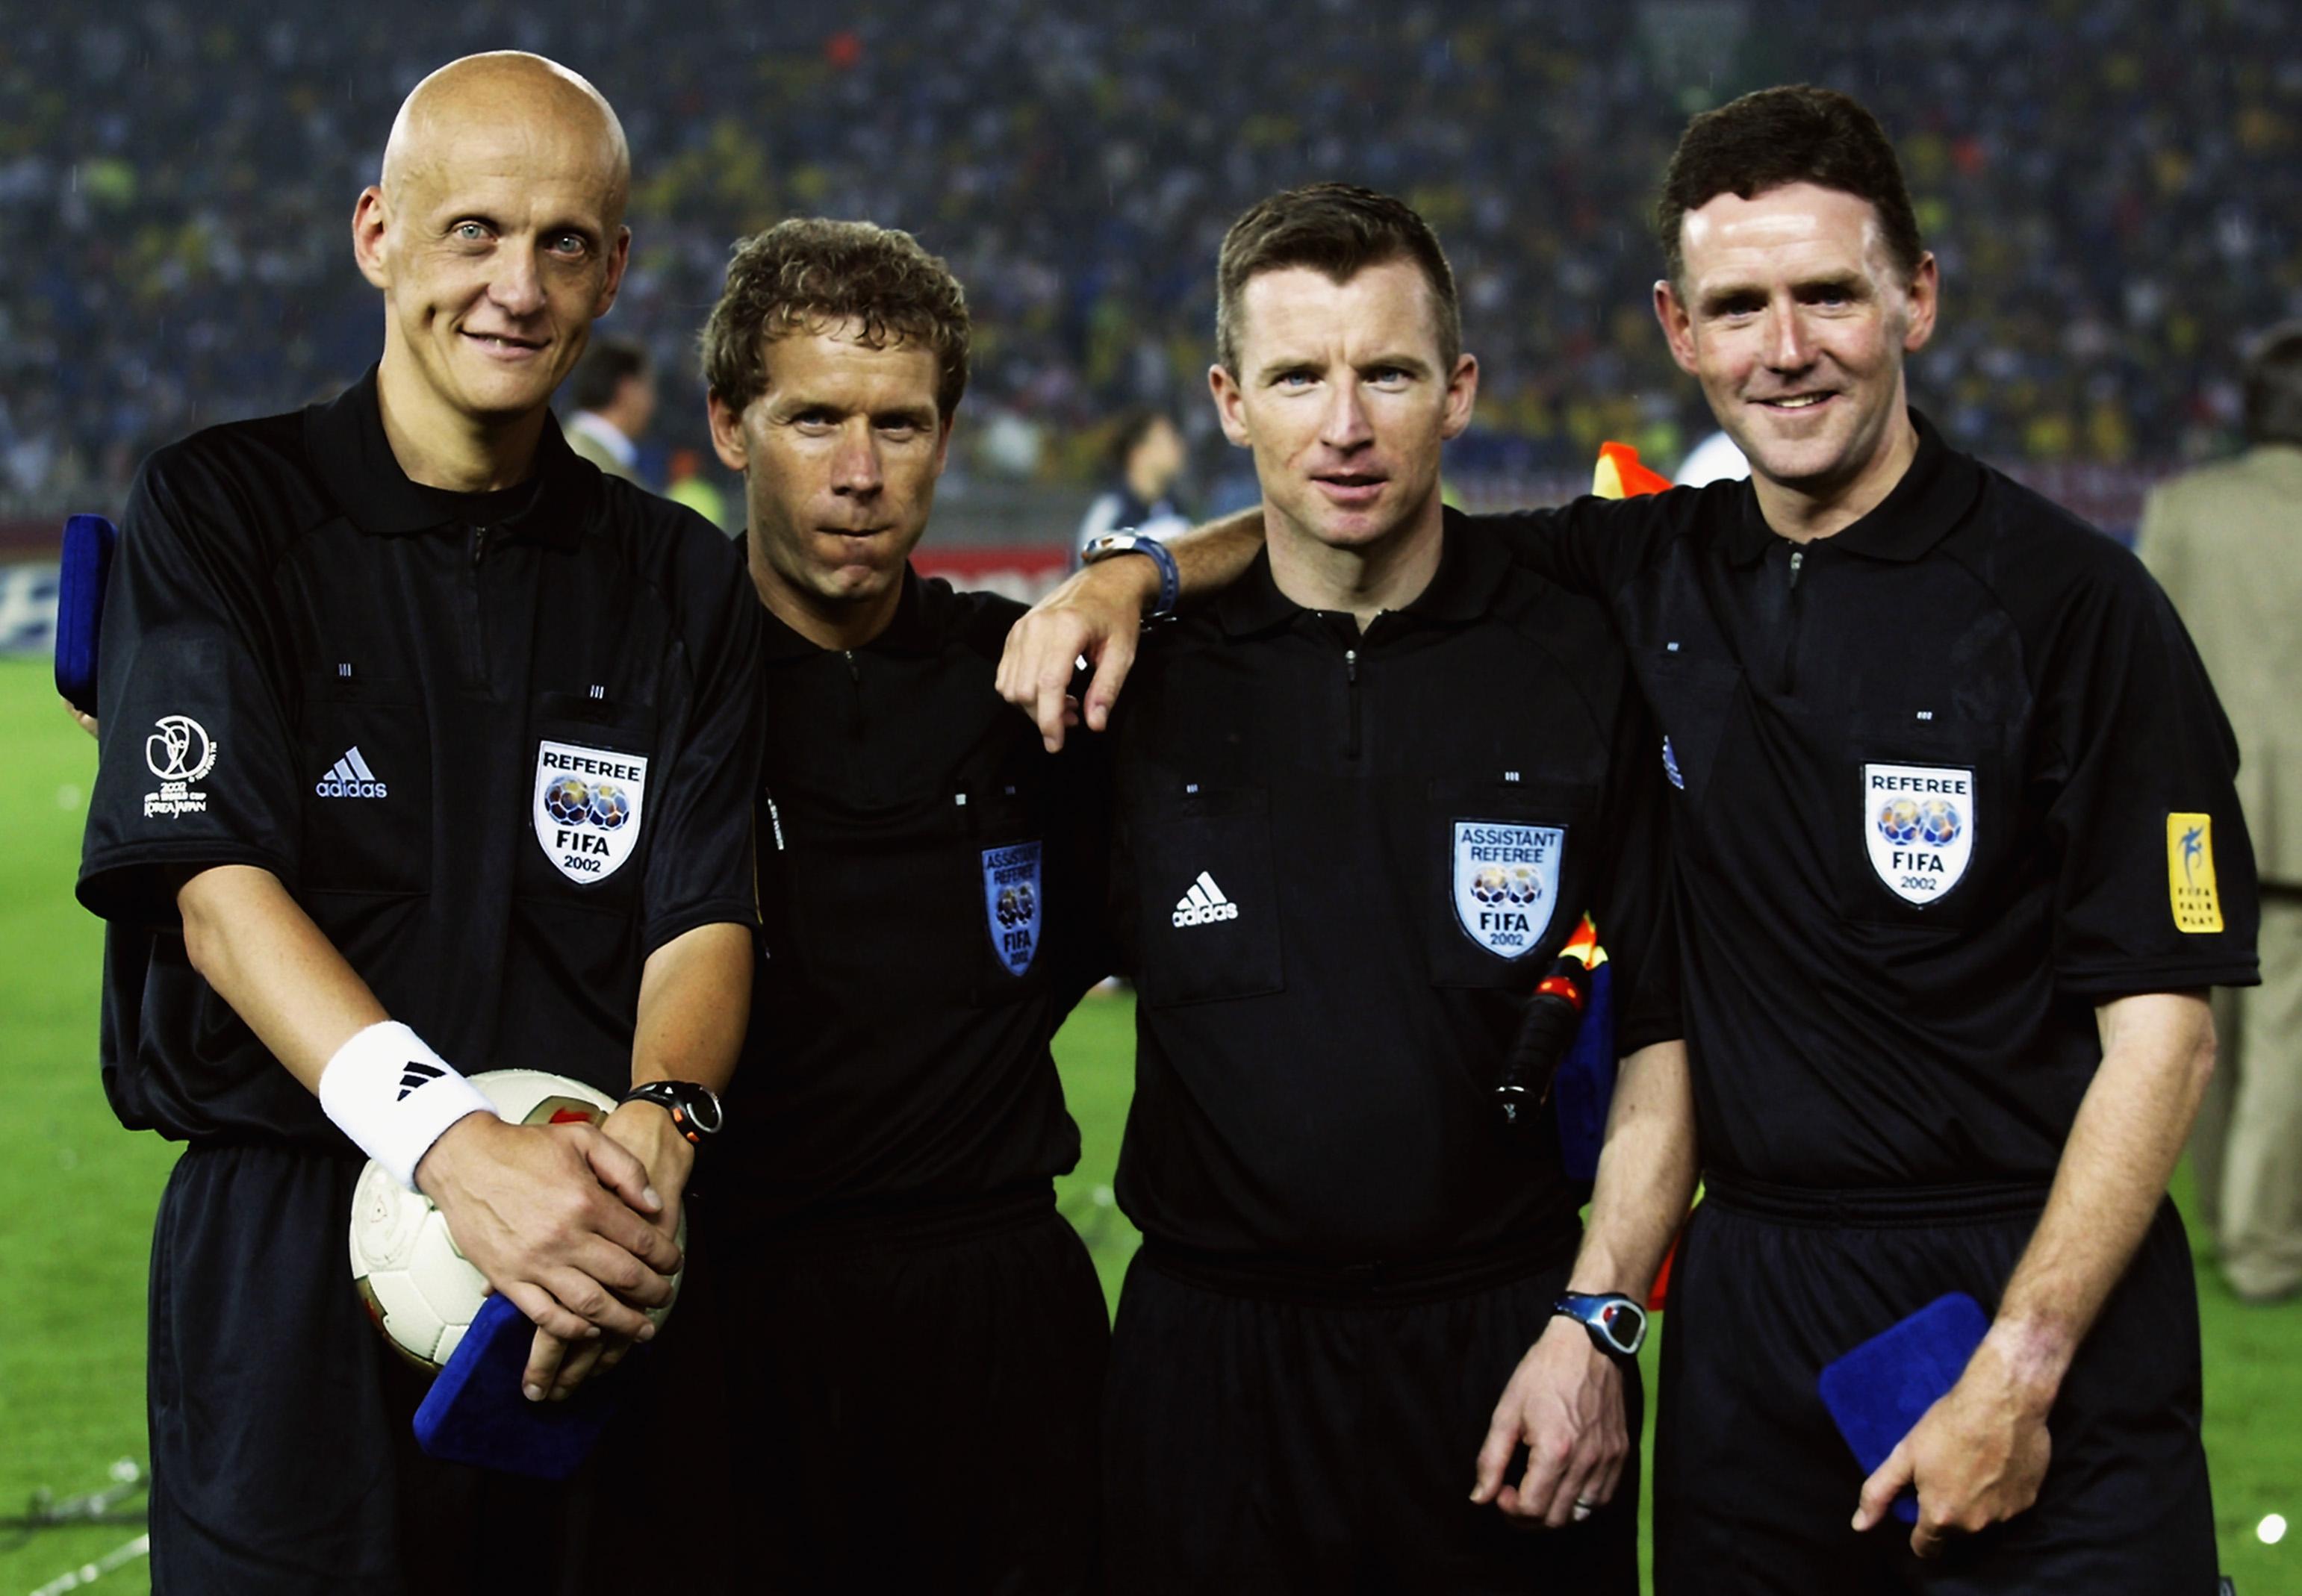 966864b1b9a YOKOHAMA - JUNE 30: Referee Pierluigi Collina, assistant referees Leif  Lindberg and Phillip Sharp